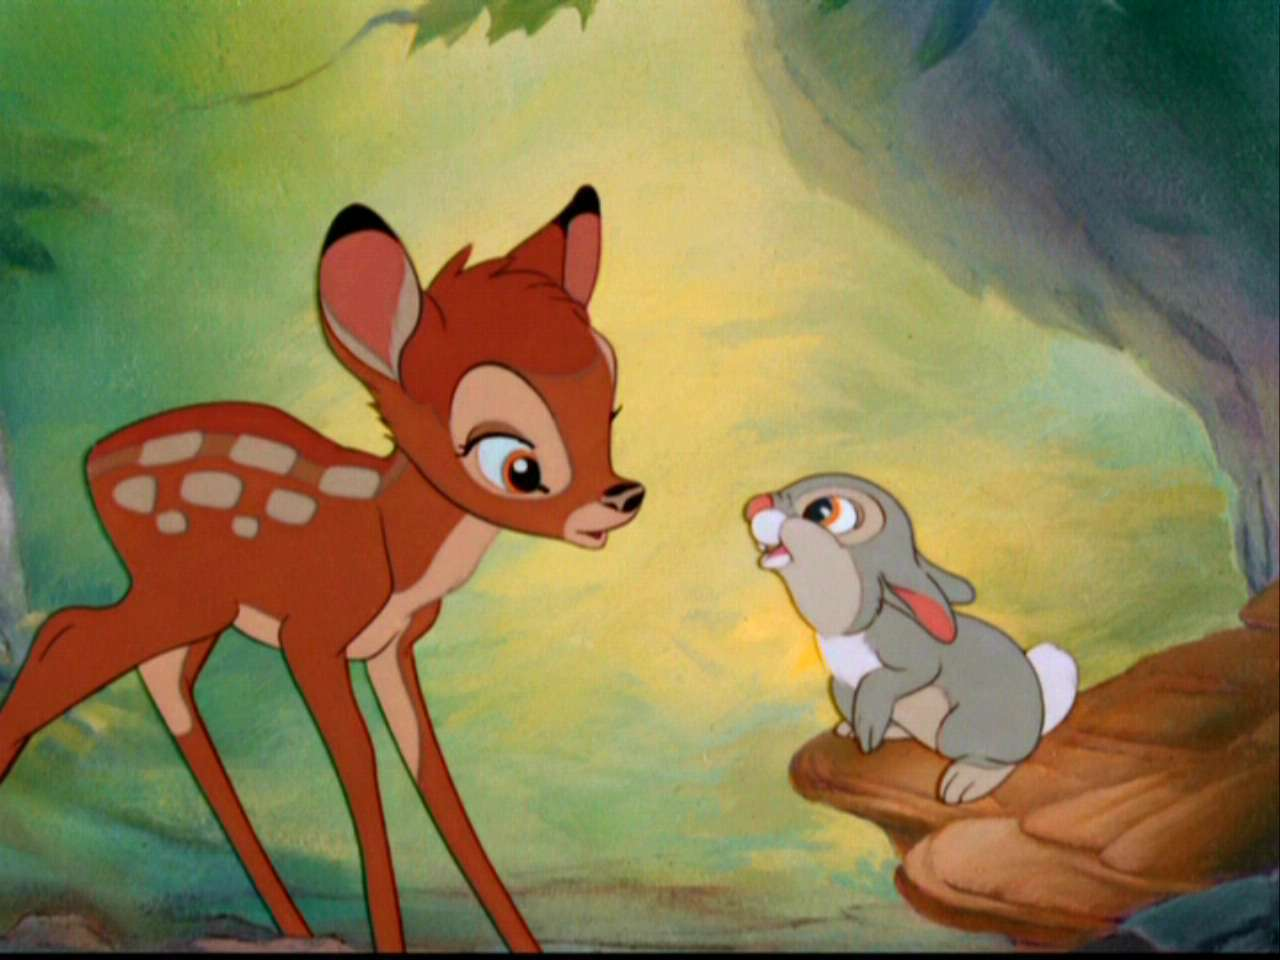 Bambi bambi 5777775 1280 960jpg 1280x960